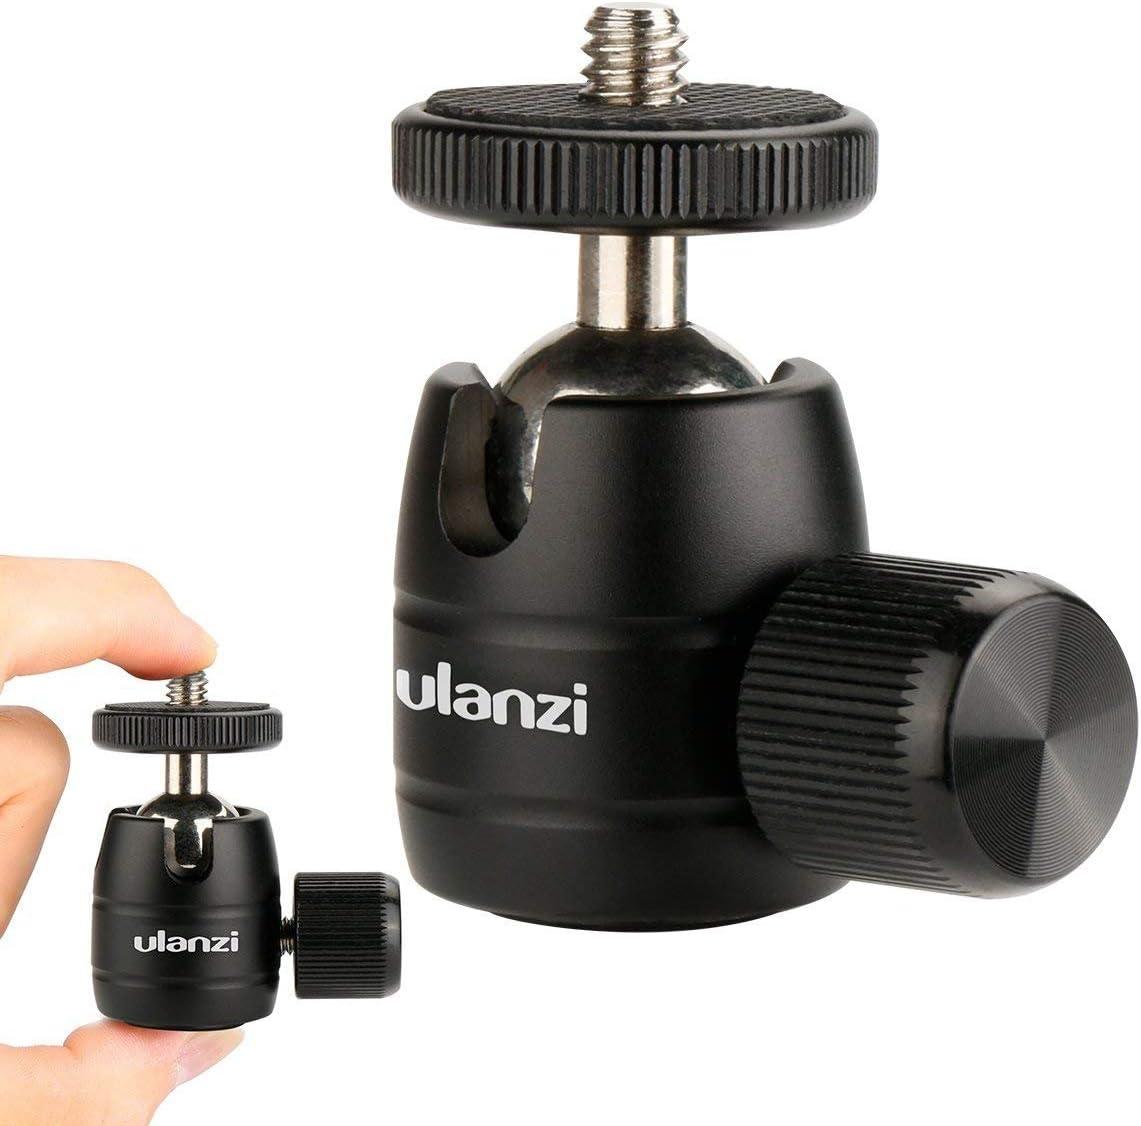 "Ulanzi U-30 Mini Ball Head,360 Degree Rotating Swivel Tripod Head with 1/4""3/8""Thread Base Mount for DSLR Camera like Canon,Nikon,Sony/Camcorder/iPhone 8 7 Plus Gopro"